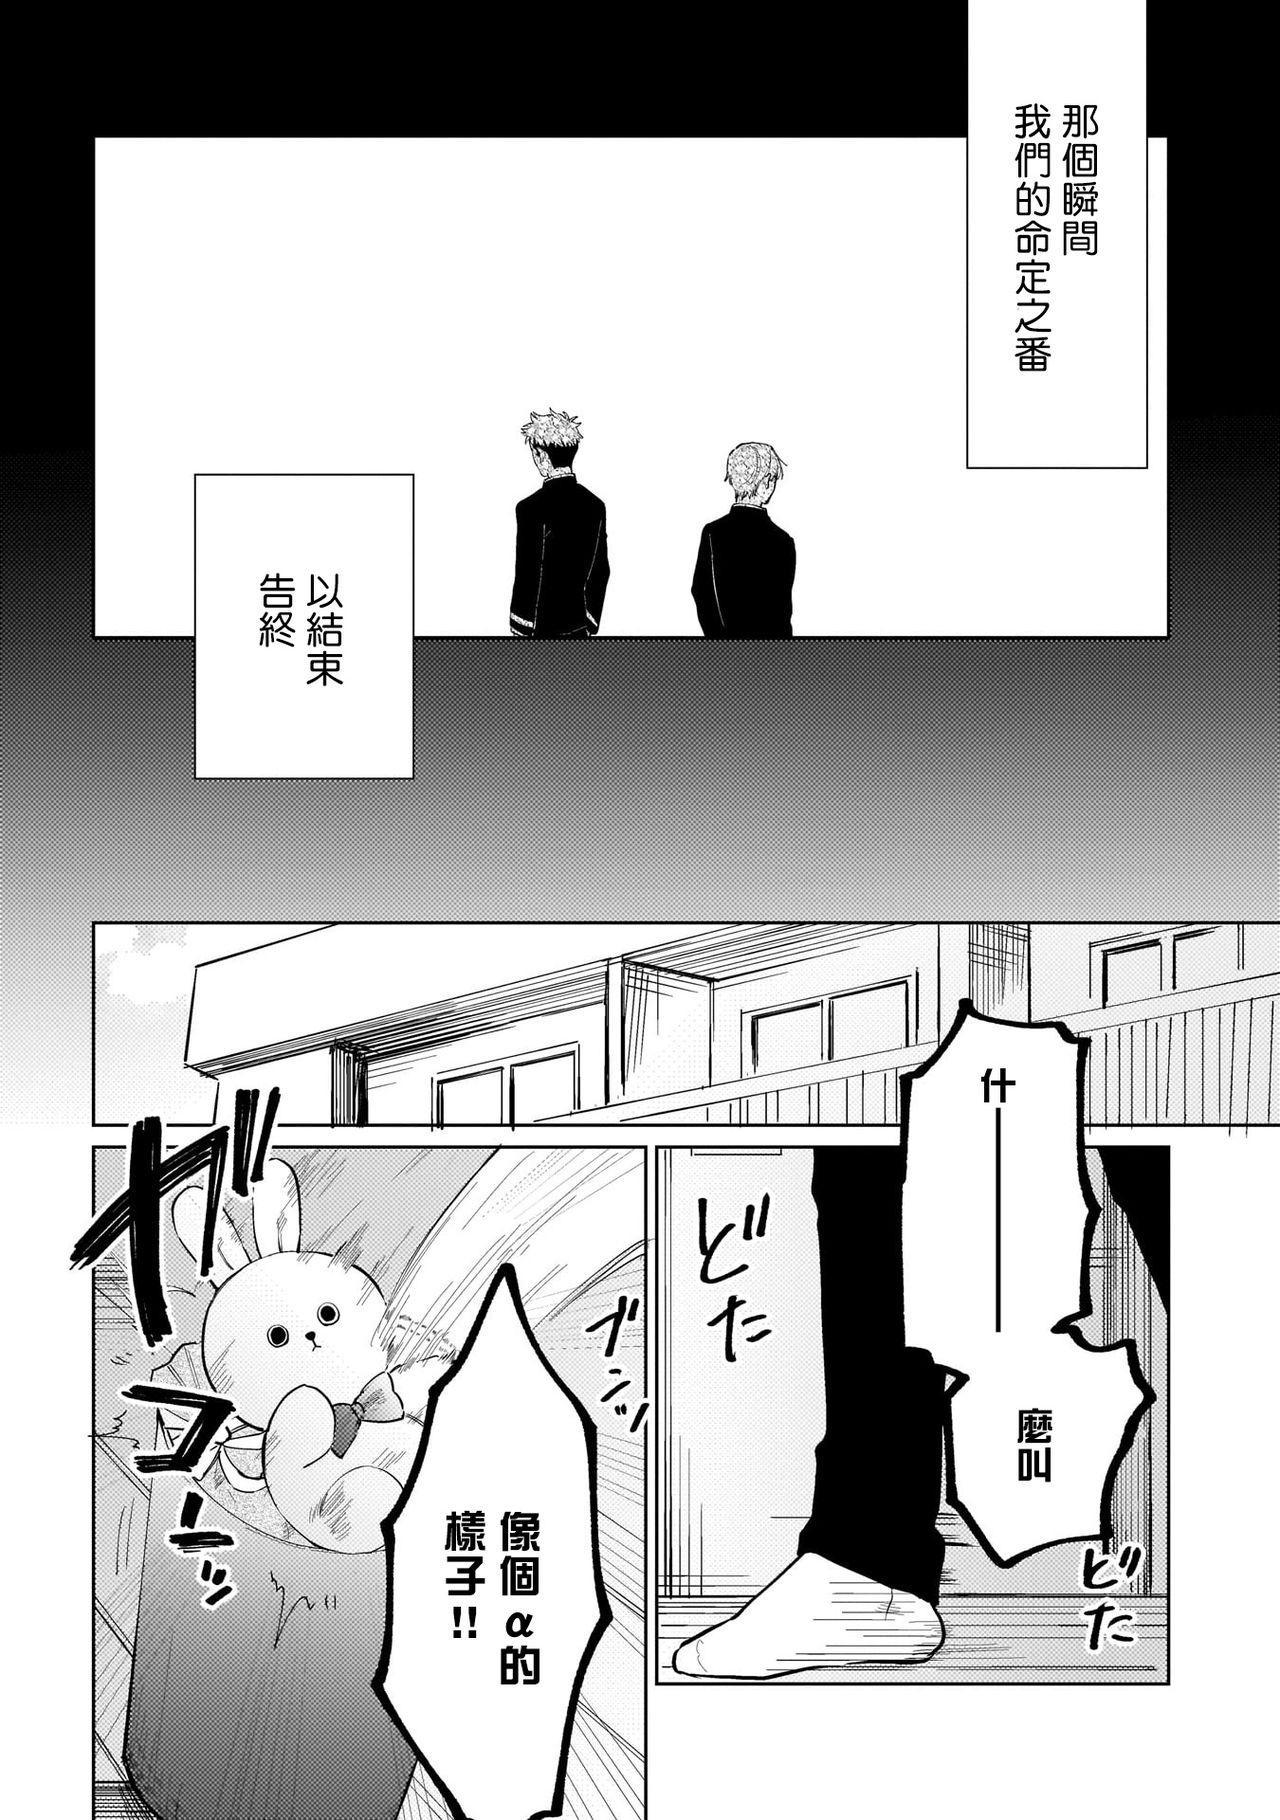 Bokura wa Unmei Janai | 我们不是命定之番 1-3 11